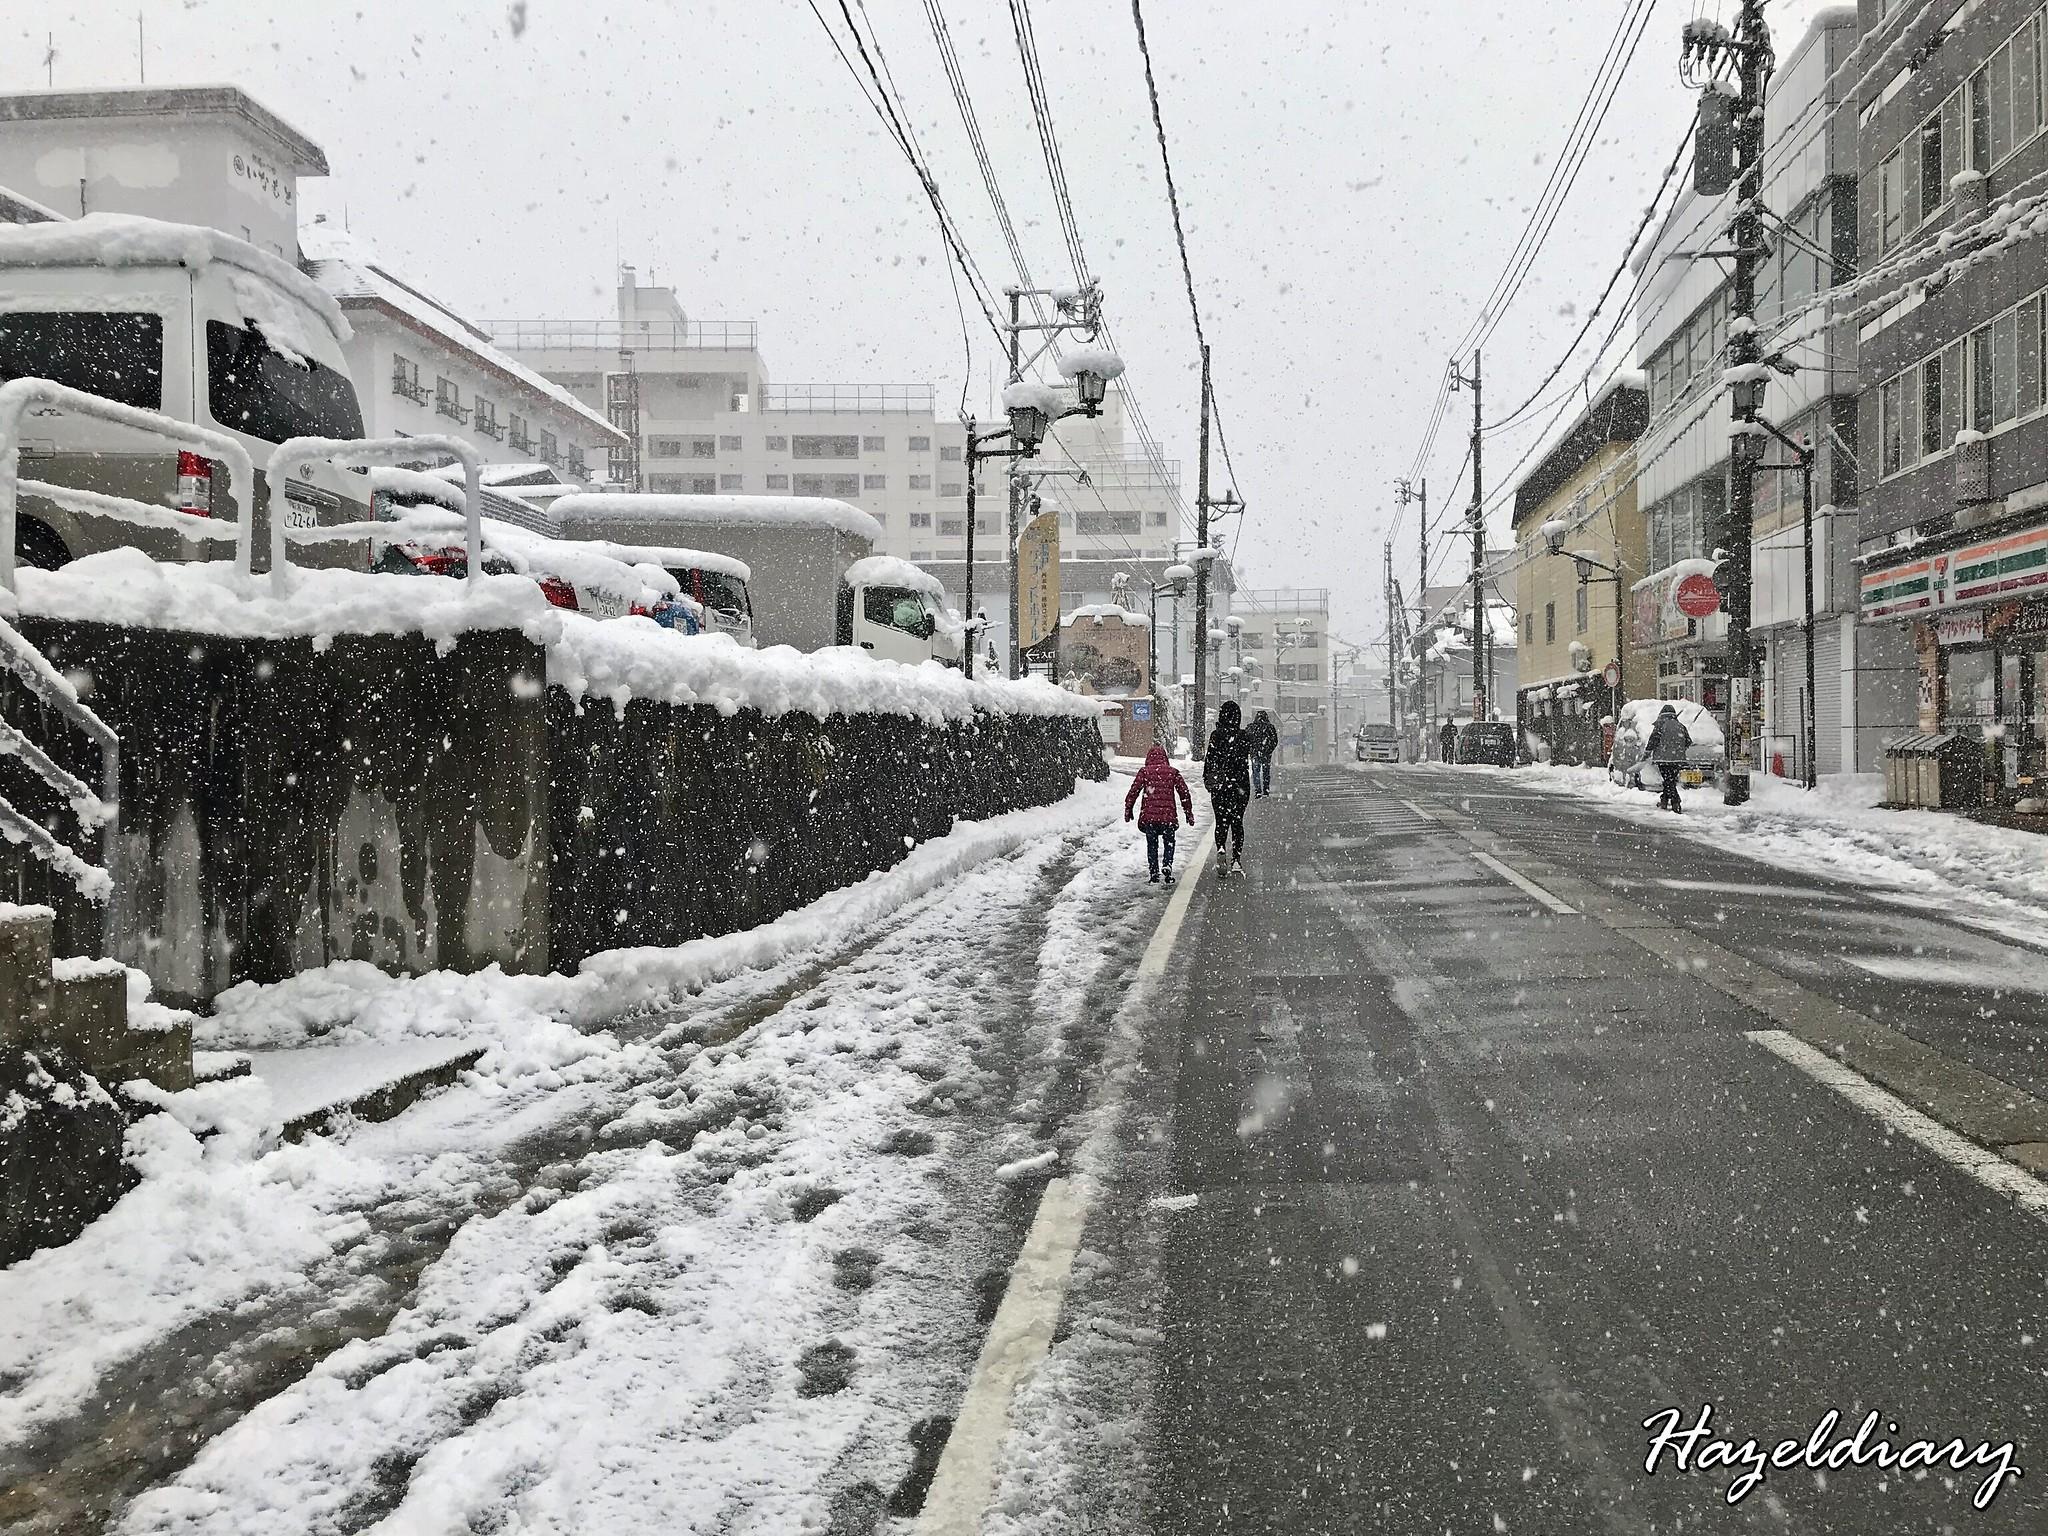 Echigo Yuzawa Japan-Hazeldiary-6